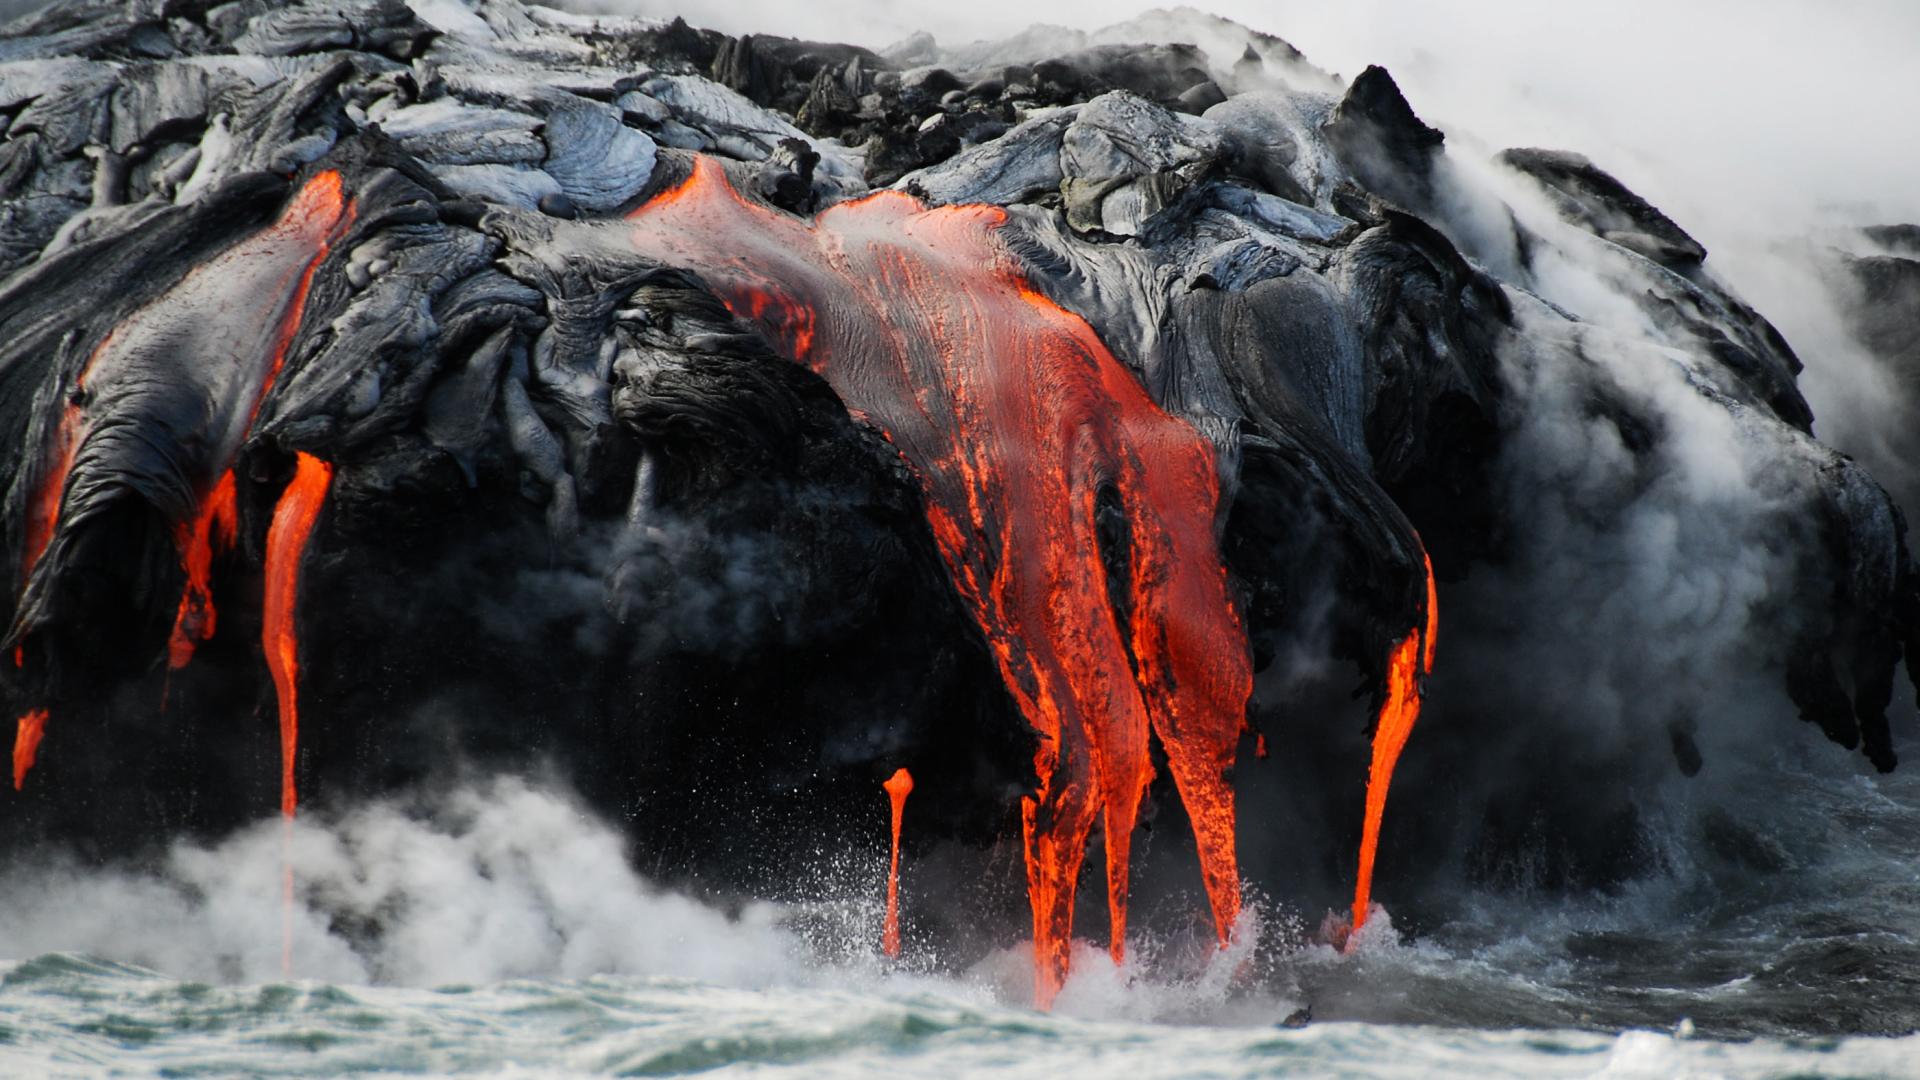 Volcano HD Wallpaper Background 38932 Wallur 1920x1080